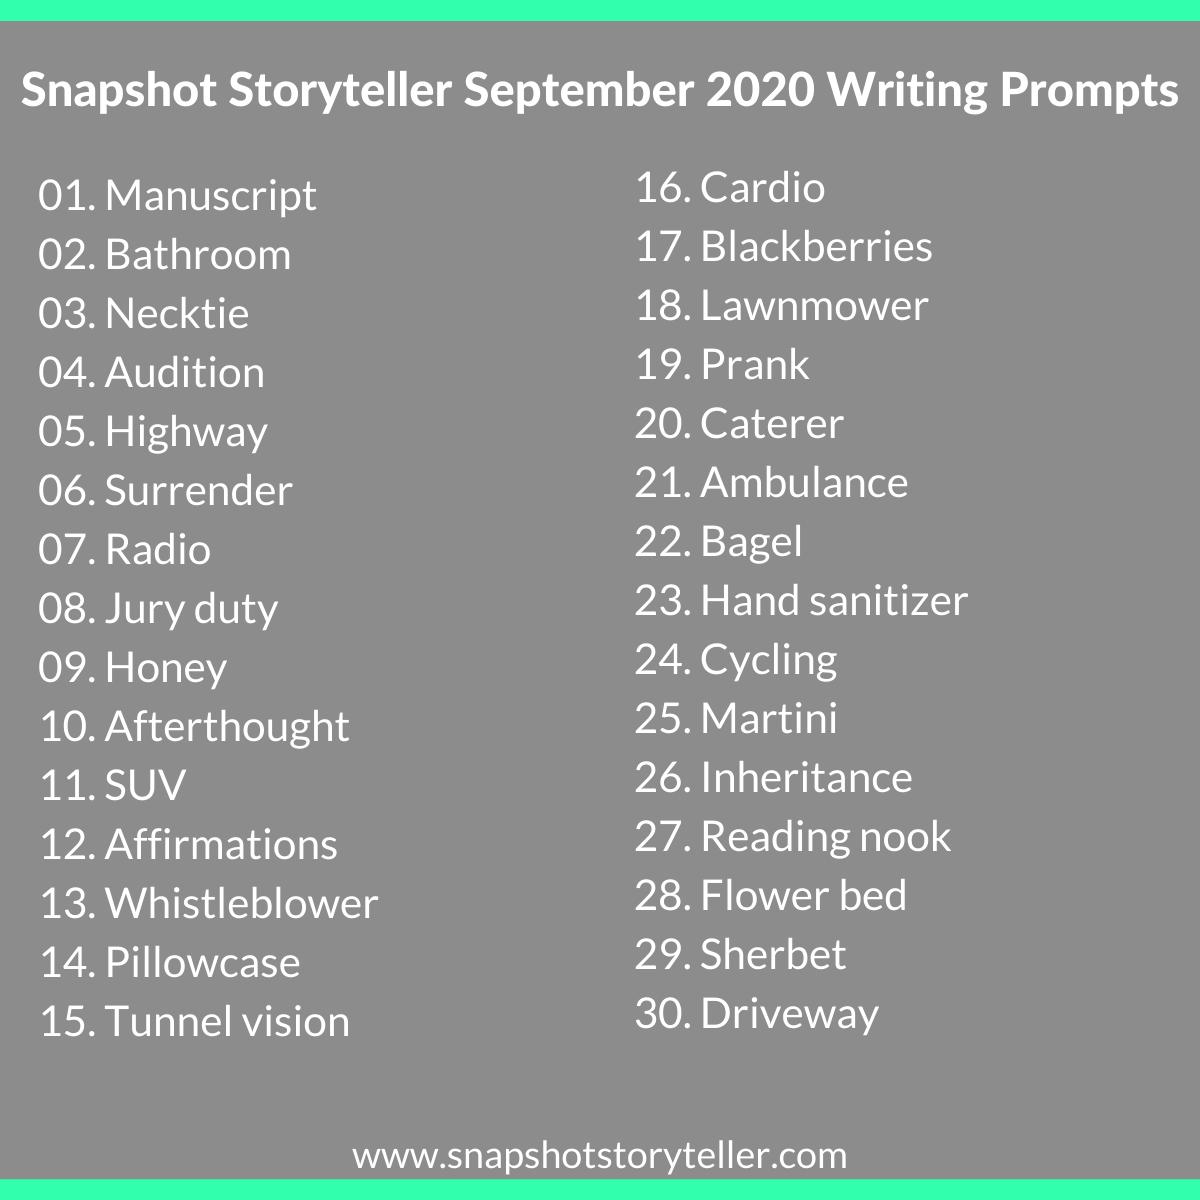 Snapshot Storyteller | September 2020 Writing Prompts | www.snapshotstoryteller.com | #amwriting #SnapshotStoryteller #creativestoryteller #creative #storyteller #creativewriter #IWrite #WriteOn #writersofinstagram#writingprompt #writingprompts